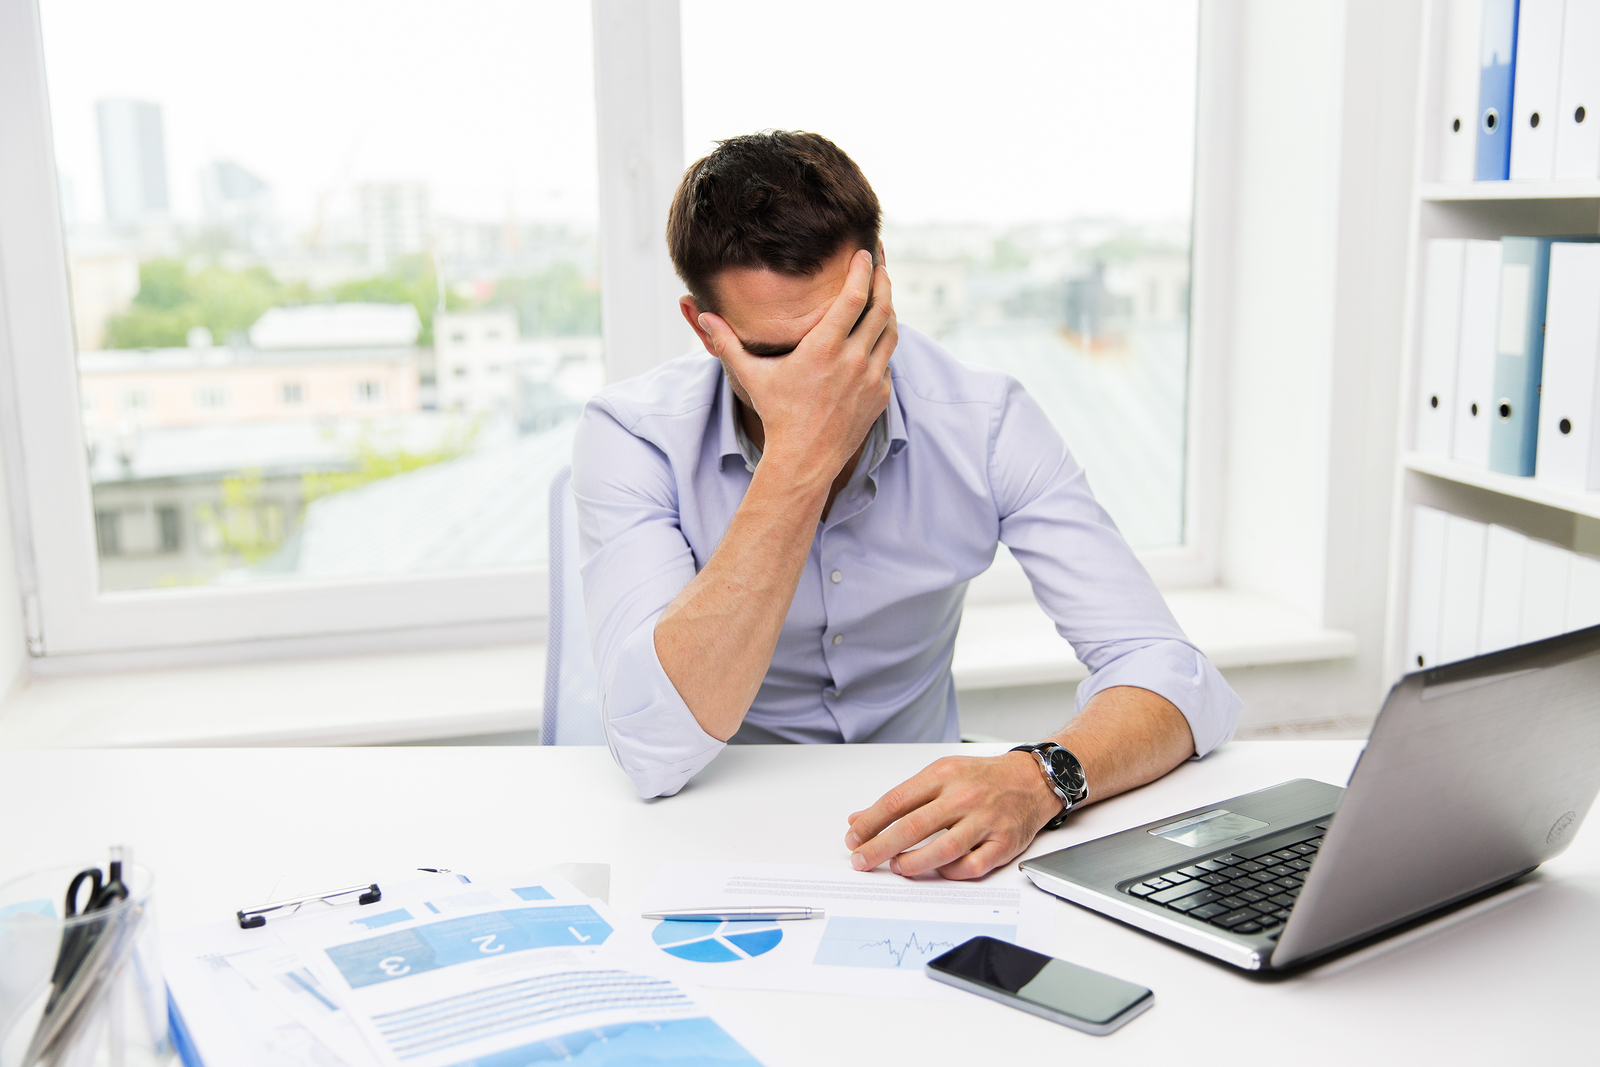 bigstock-business-people-fail-paperw-99032333.jpg